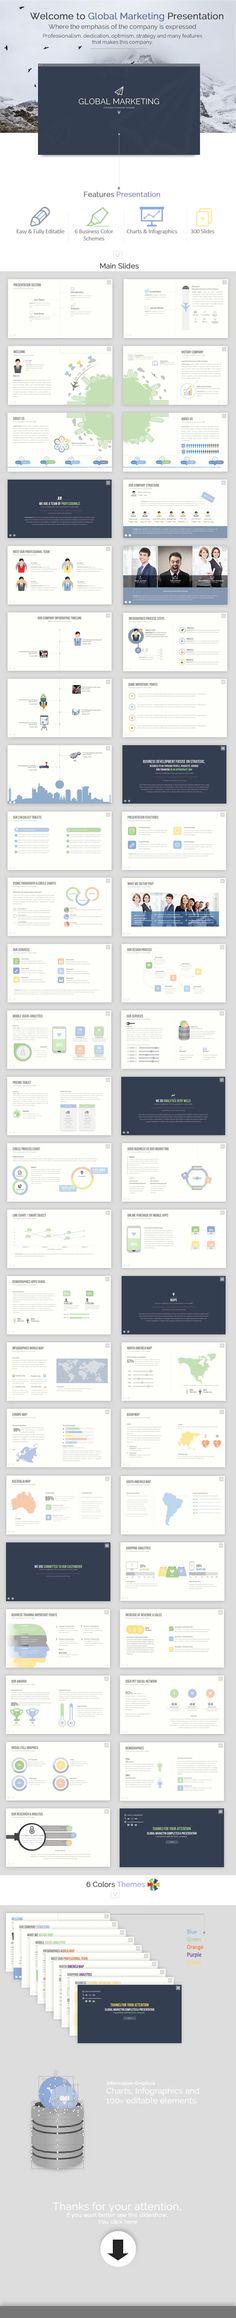 Business Global Marketing PowerPoint Presentation #design Download: http://graphicriver.net/item/business-global-marketing/11463263?ref=ksioks